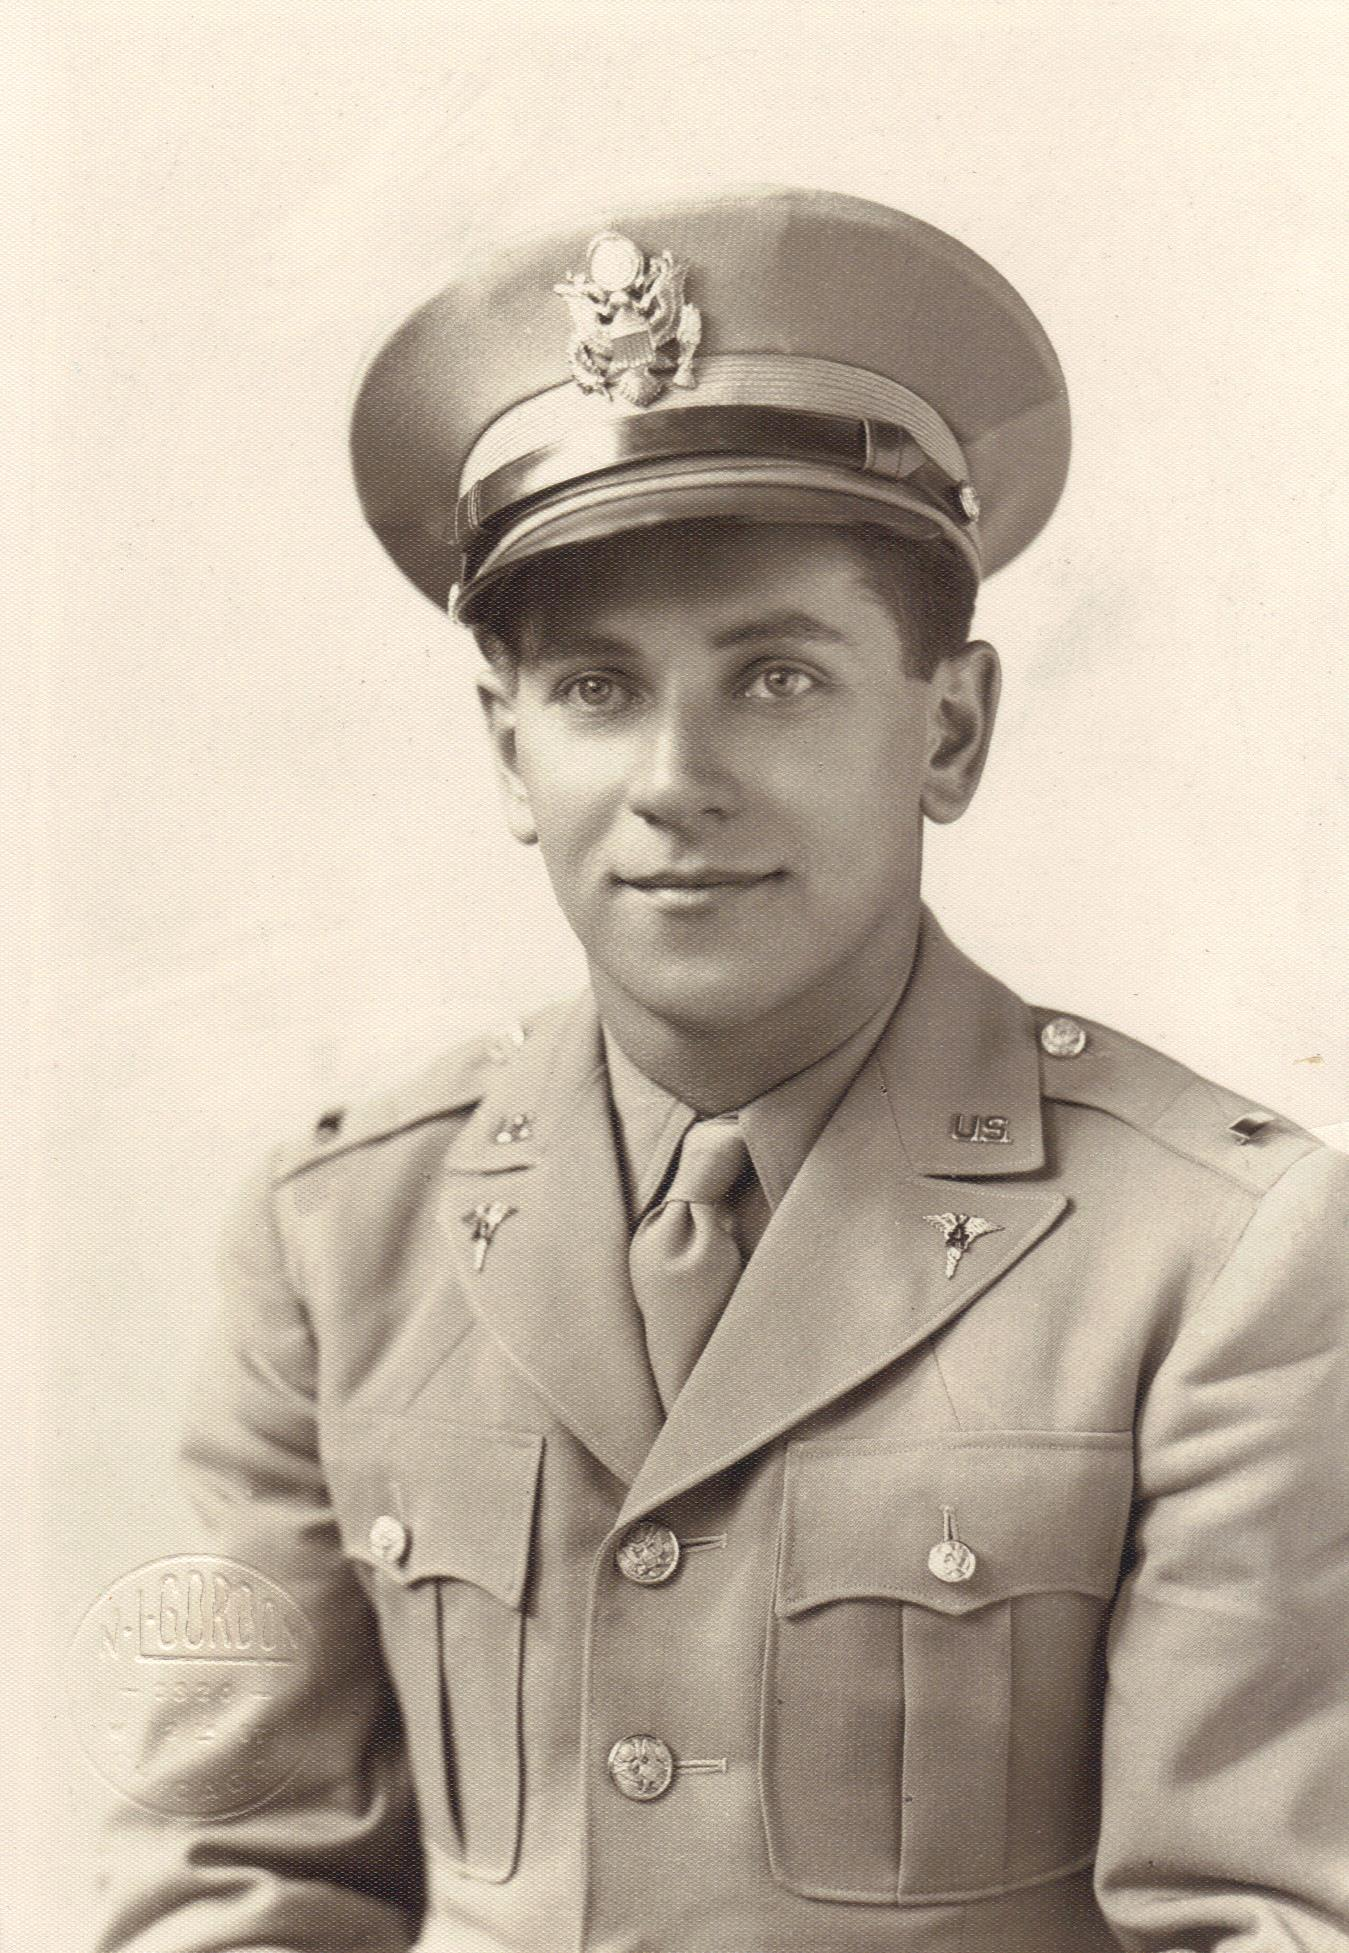 Robert F Solomon